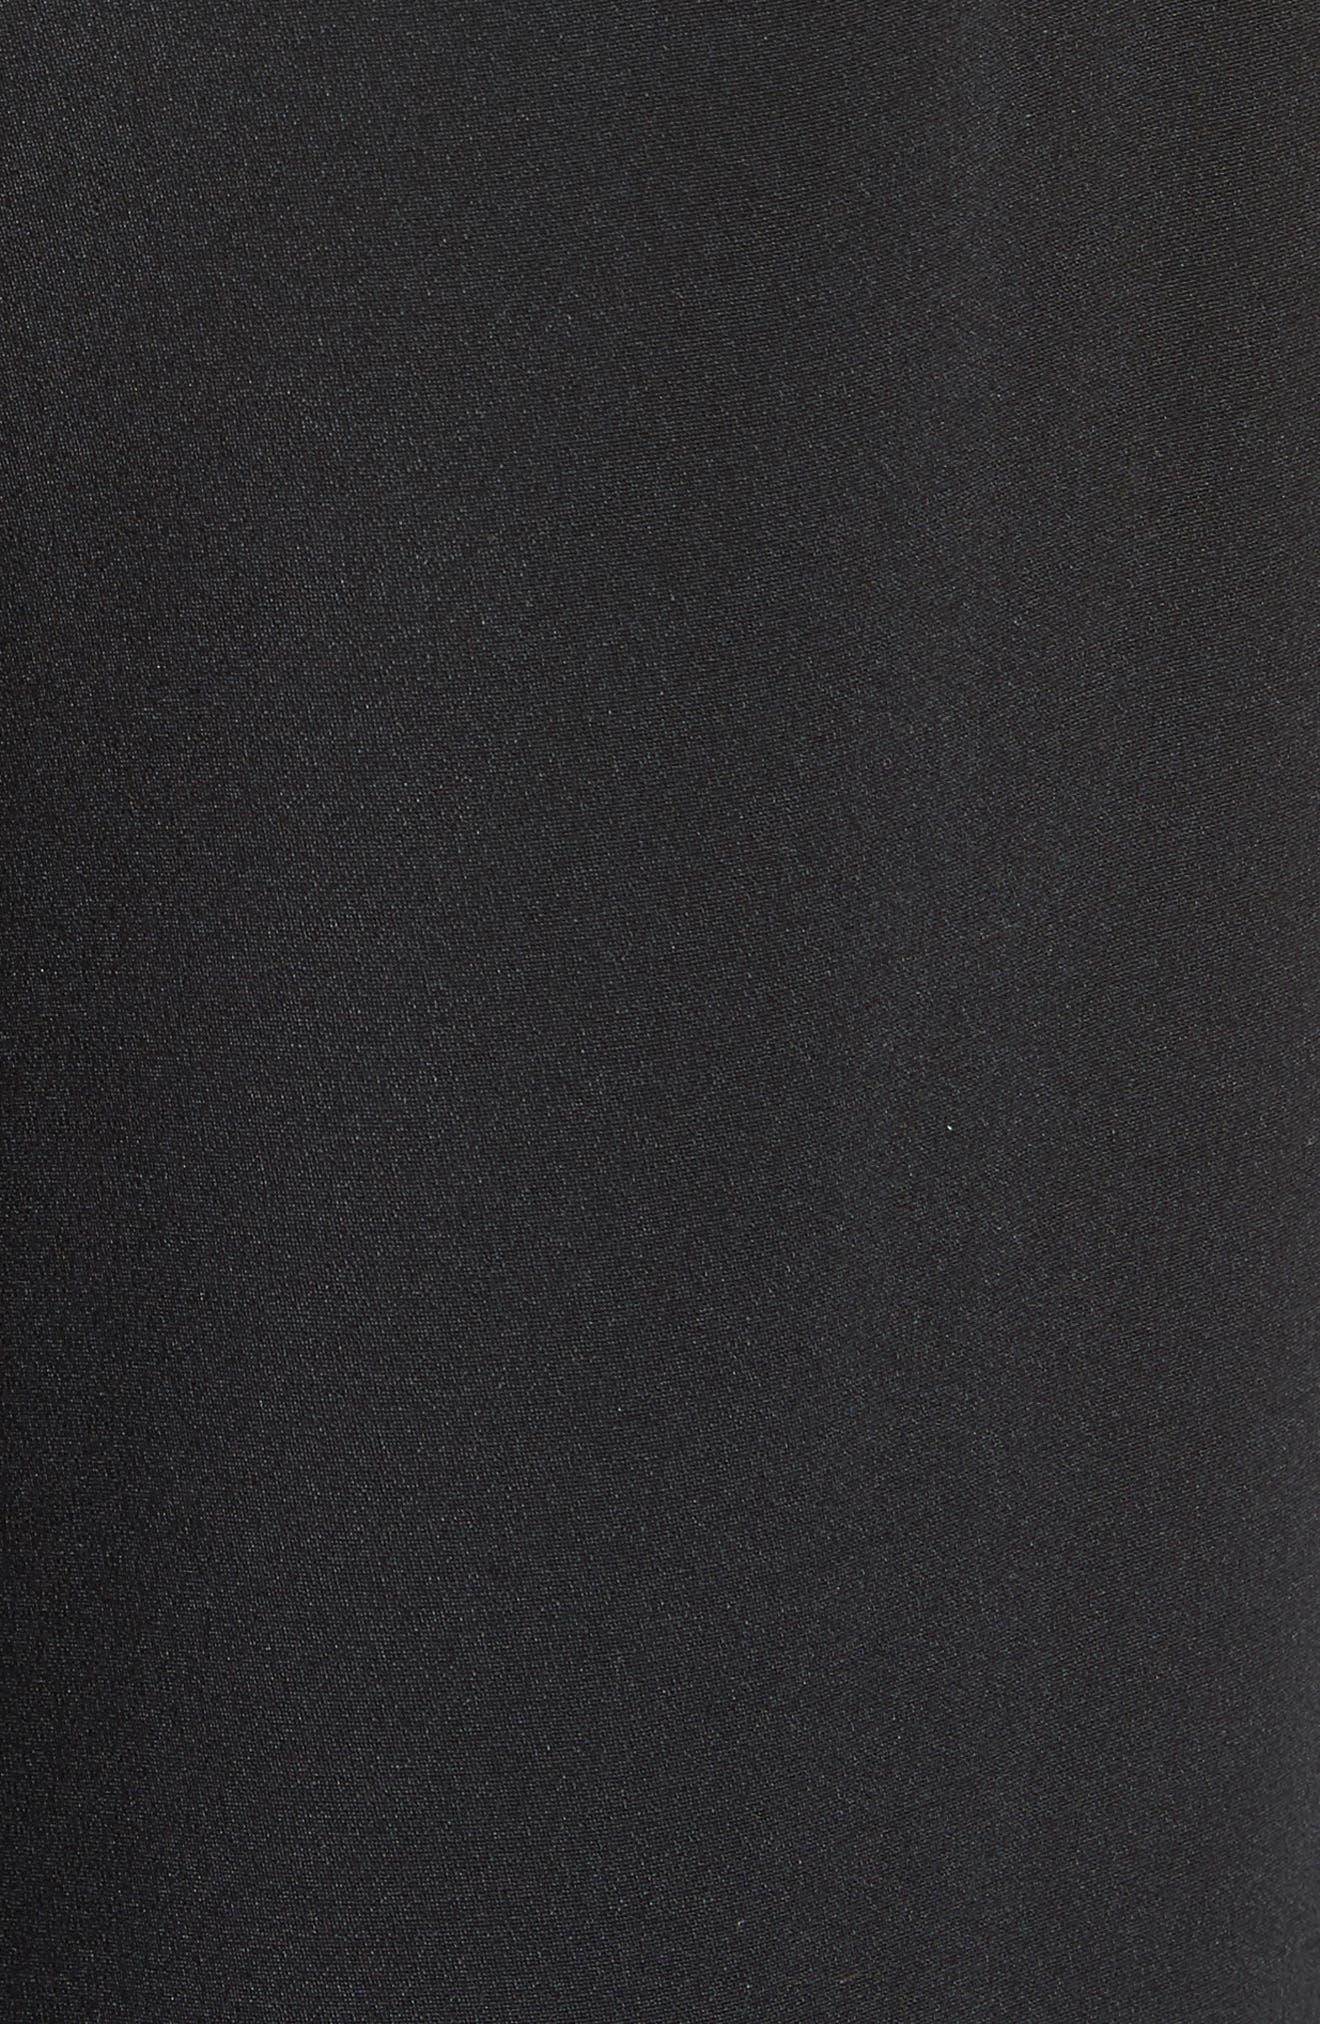 Slit Silk High Waisted Pants,                             Alternate thumbnail 5, color,                             001